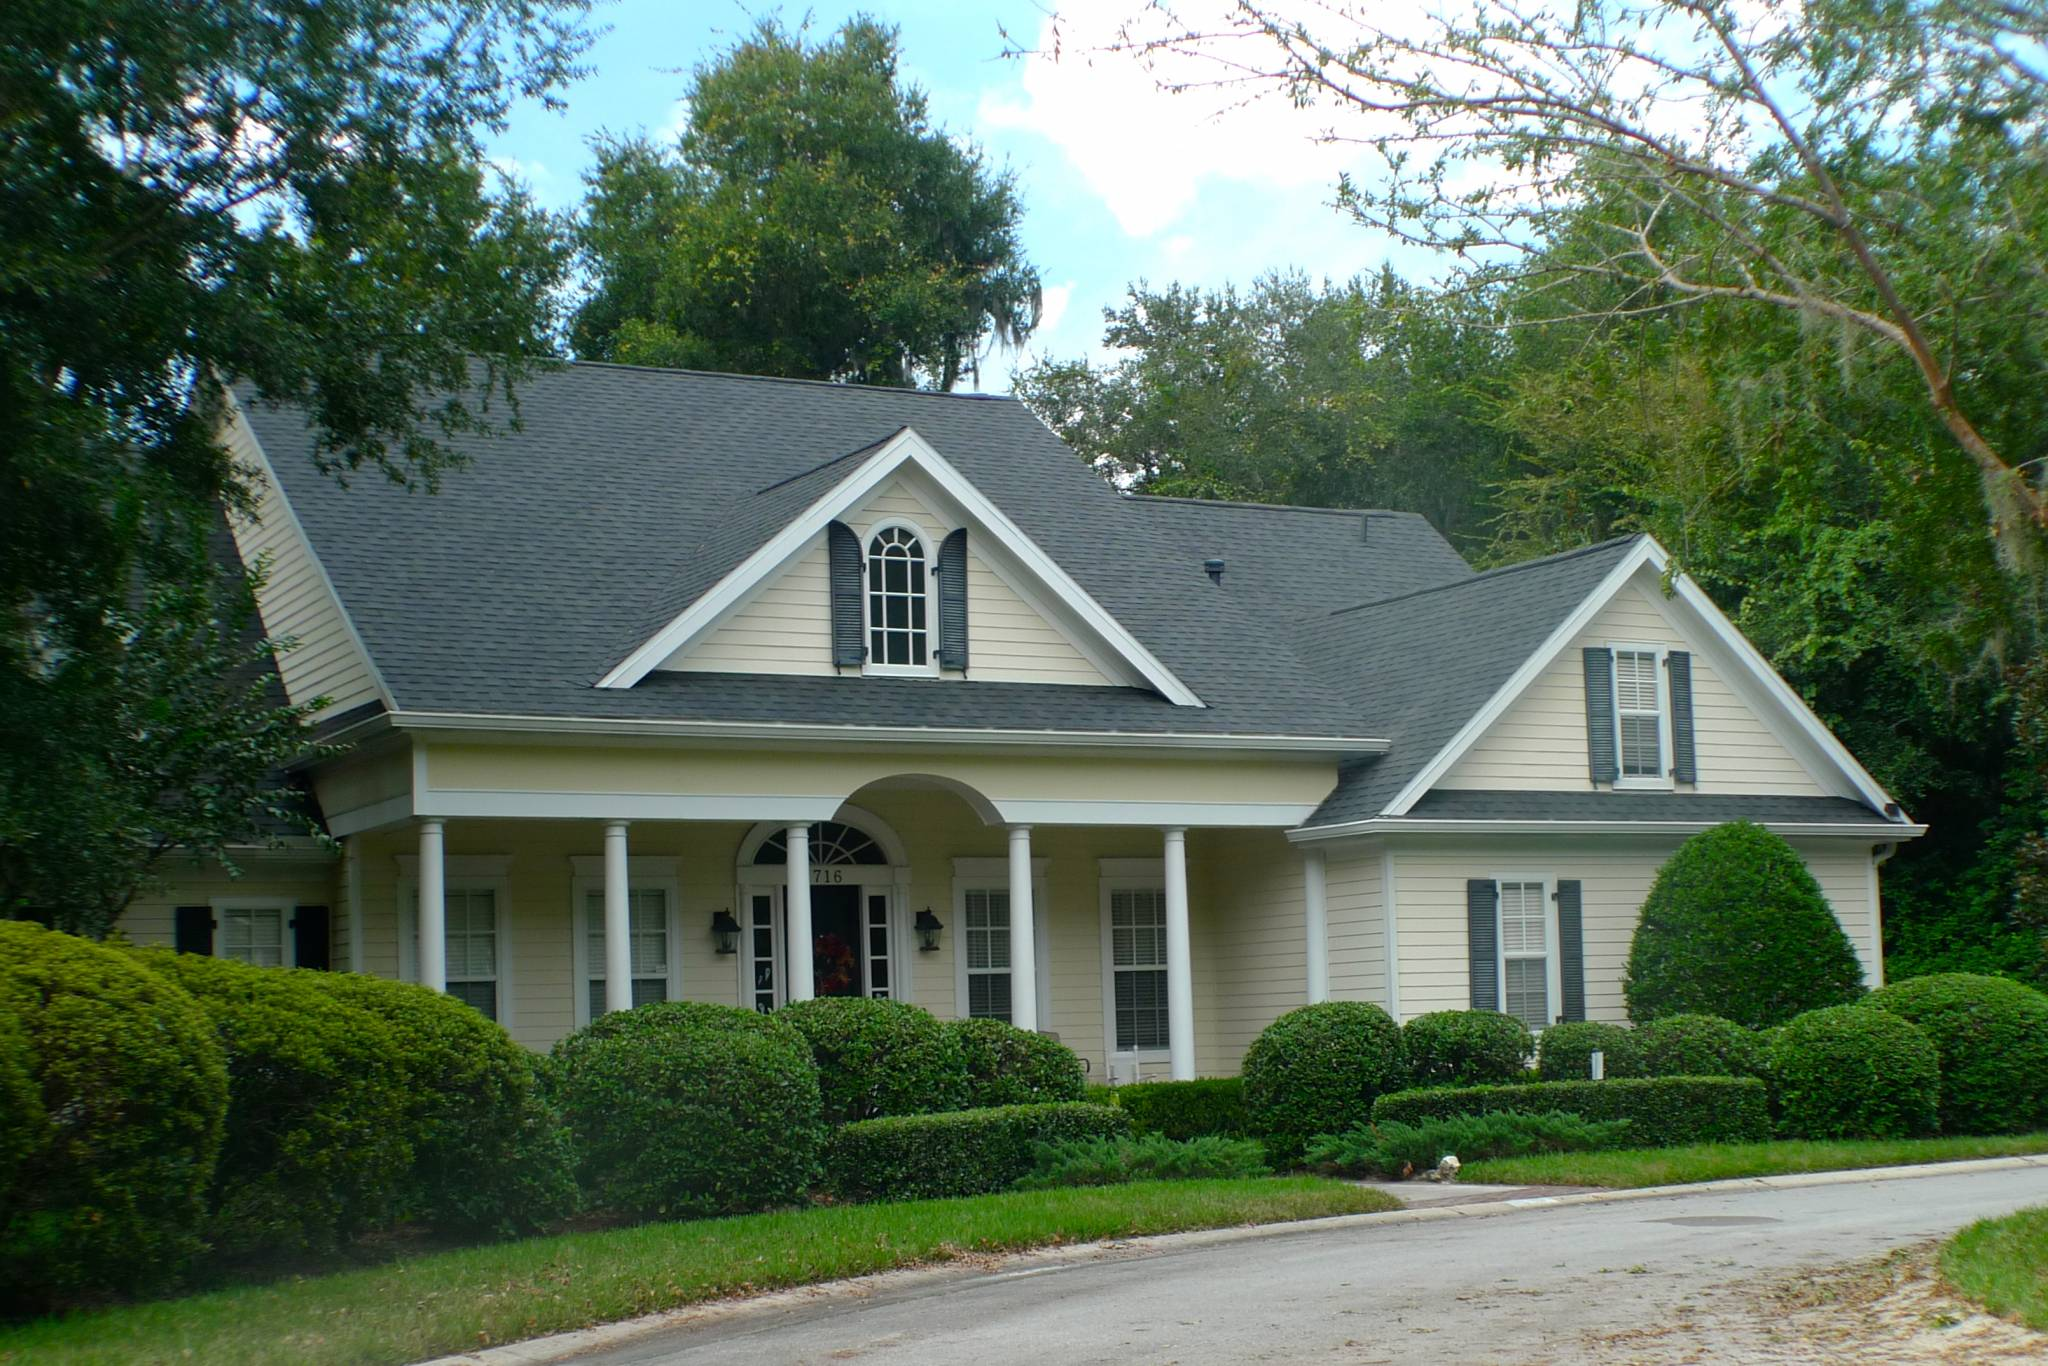 Haile plantation home owners association.